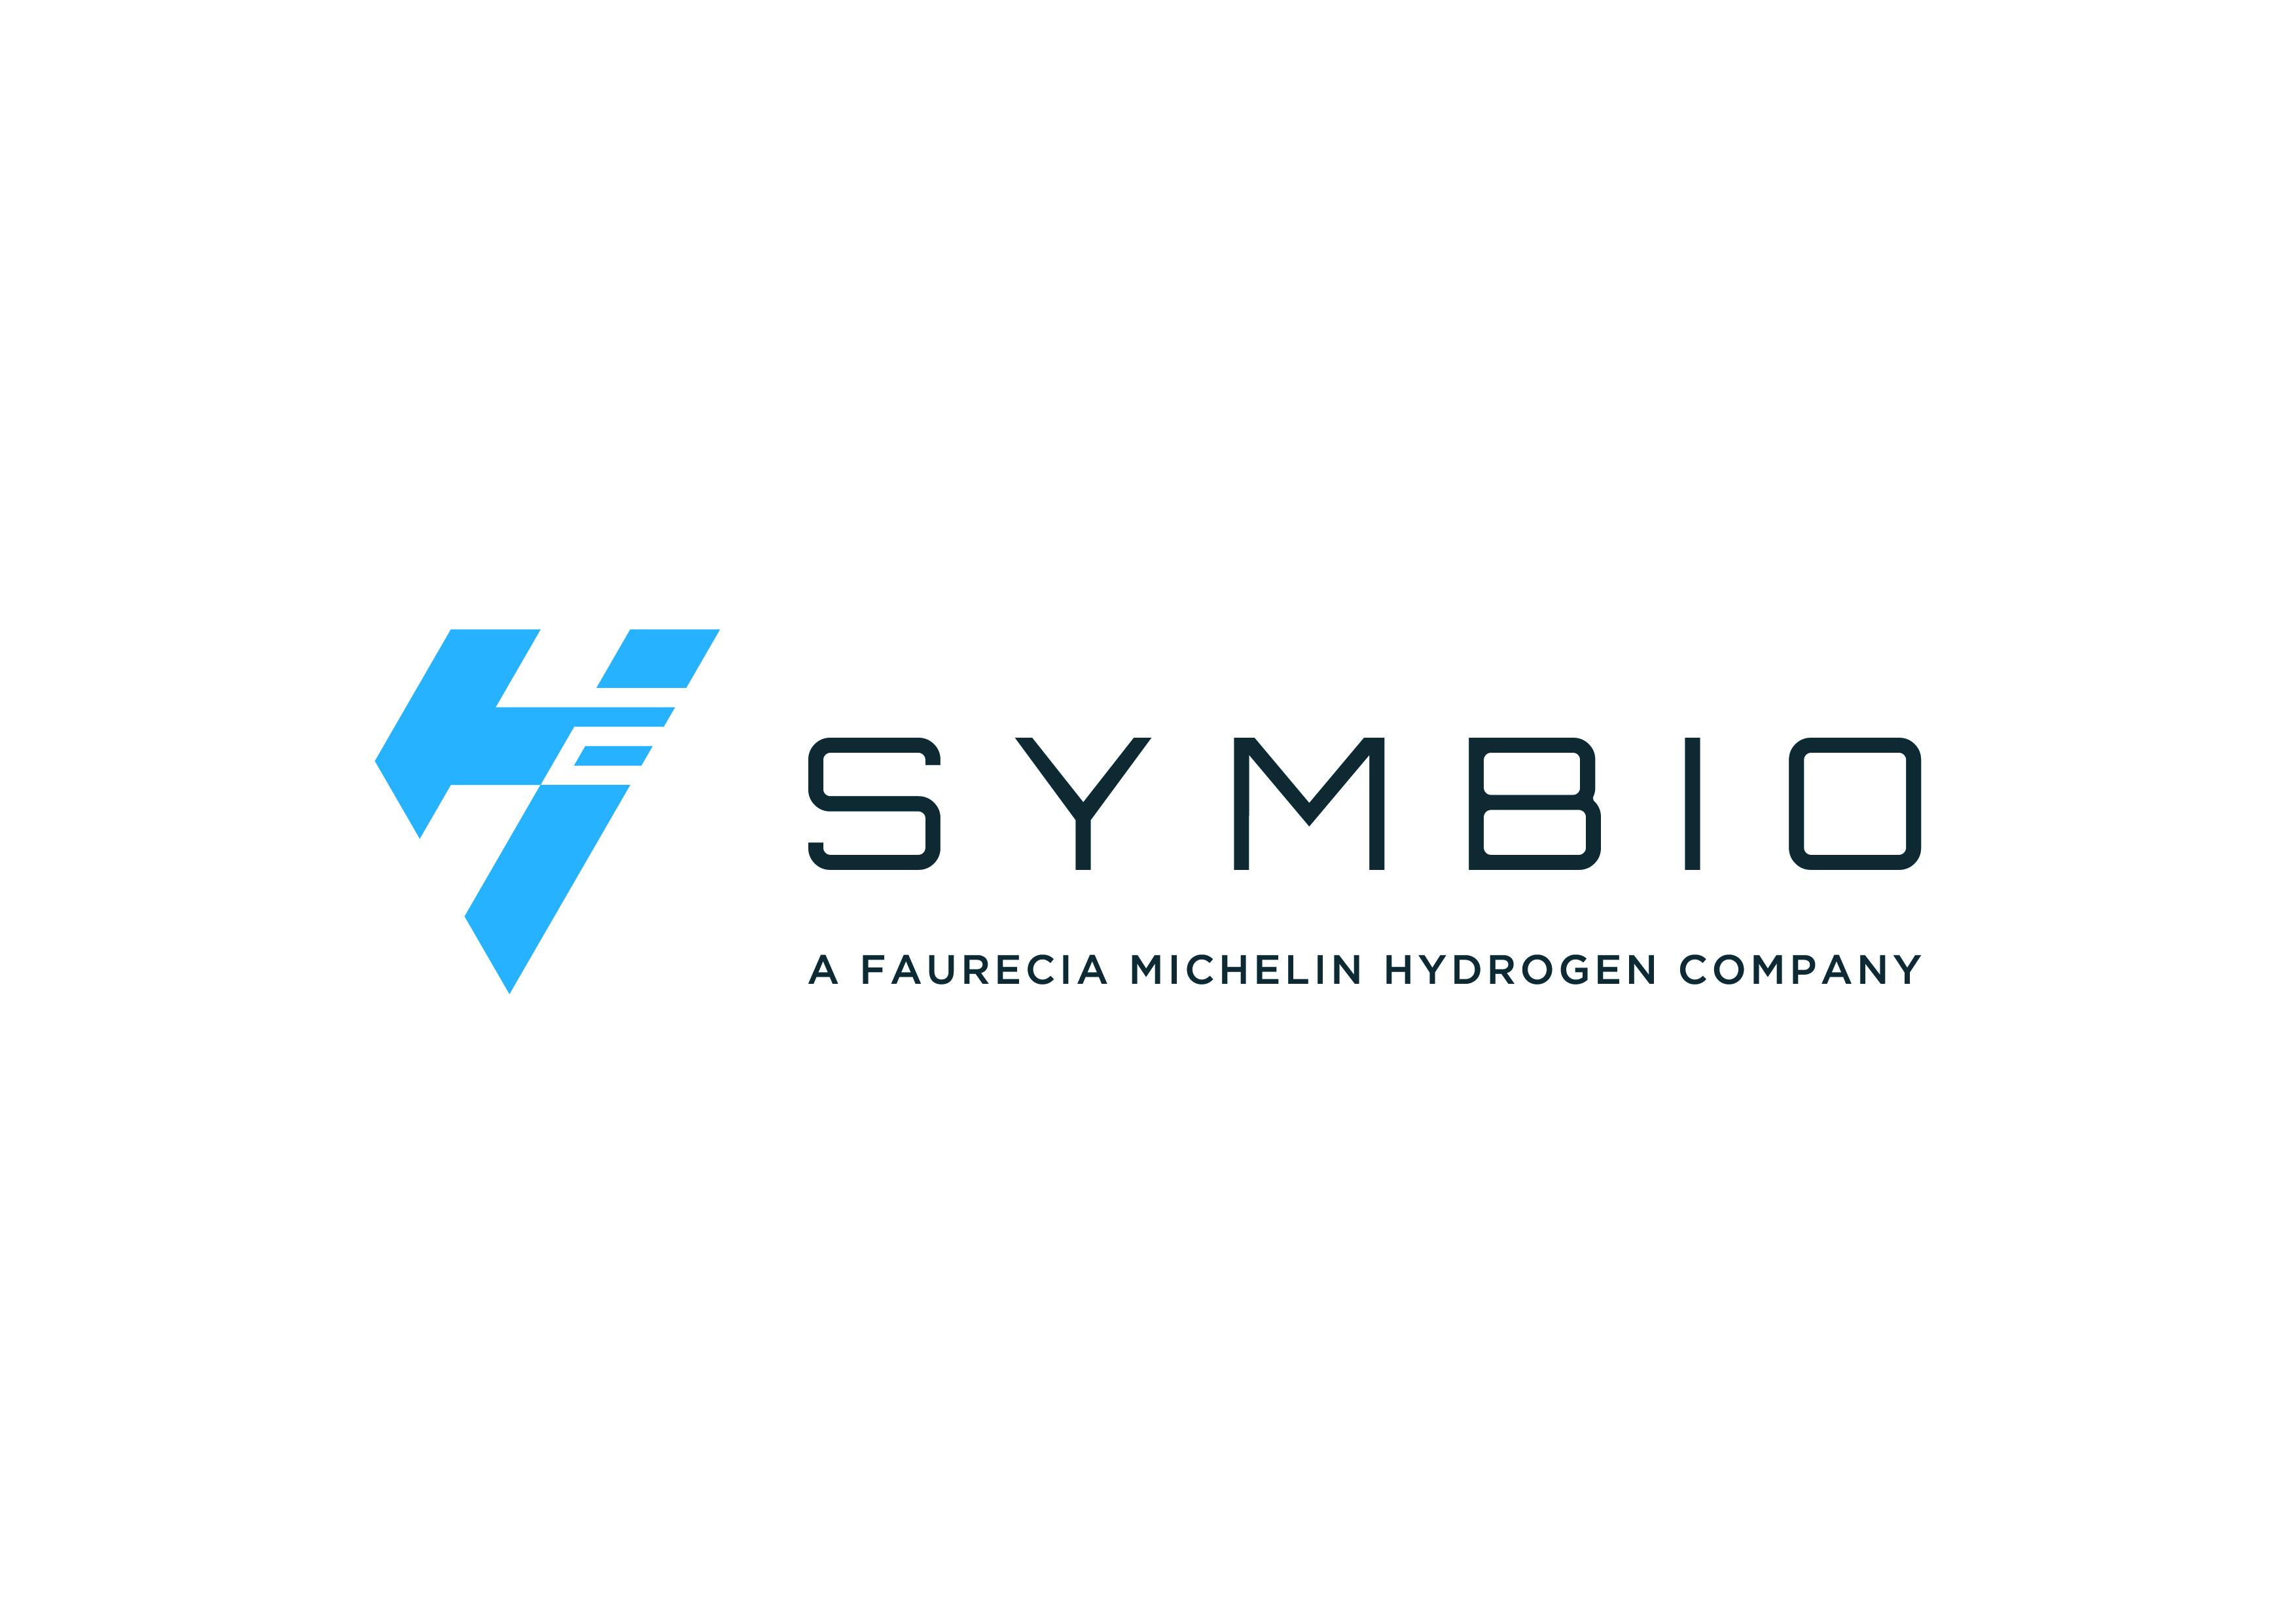 Symbio